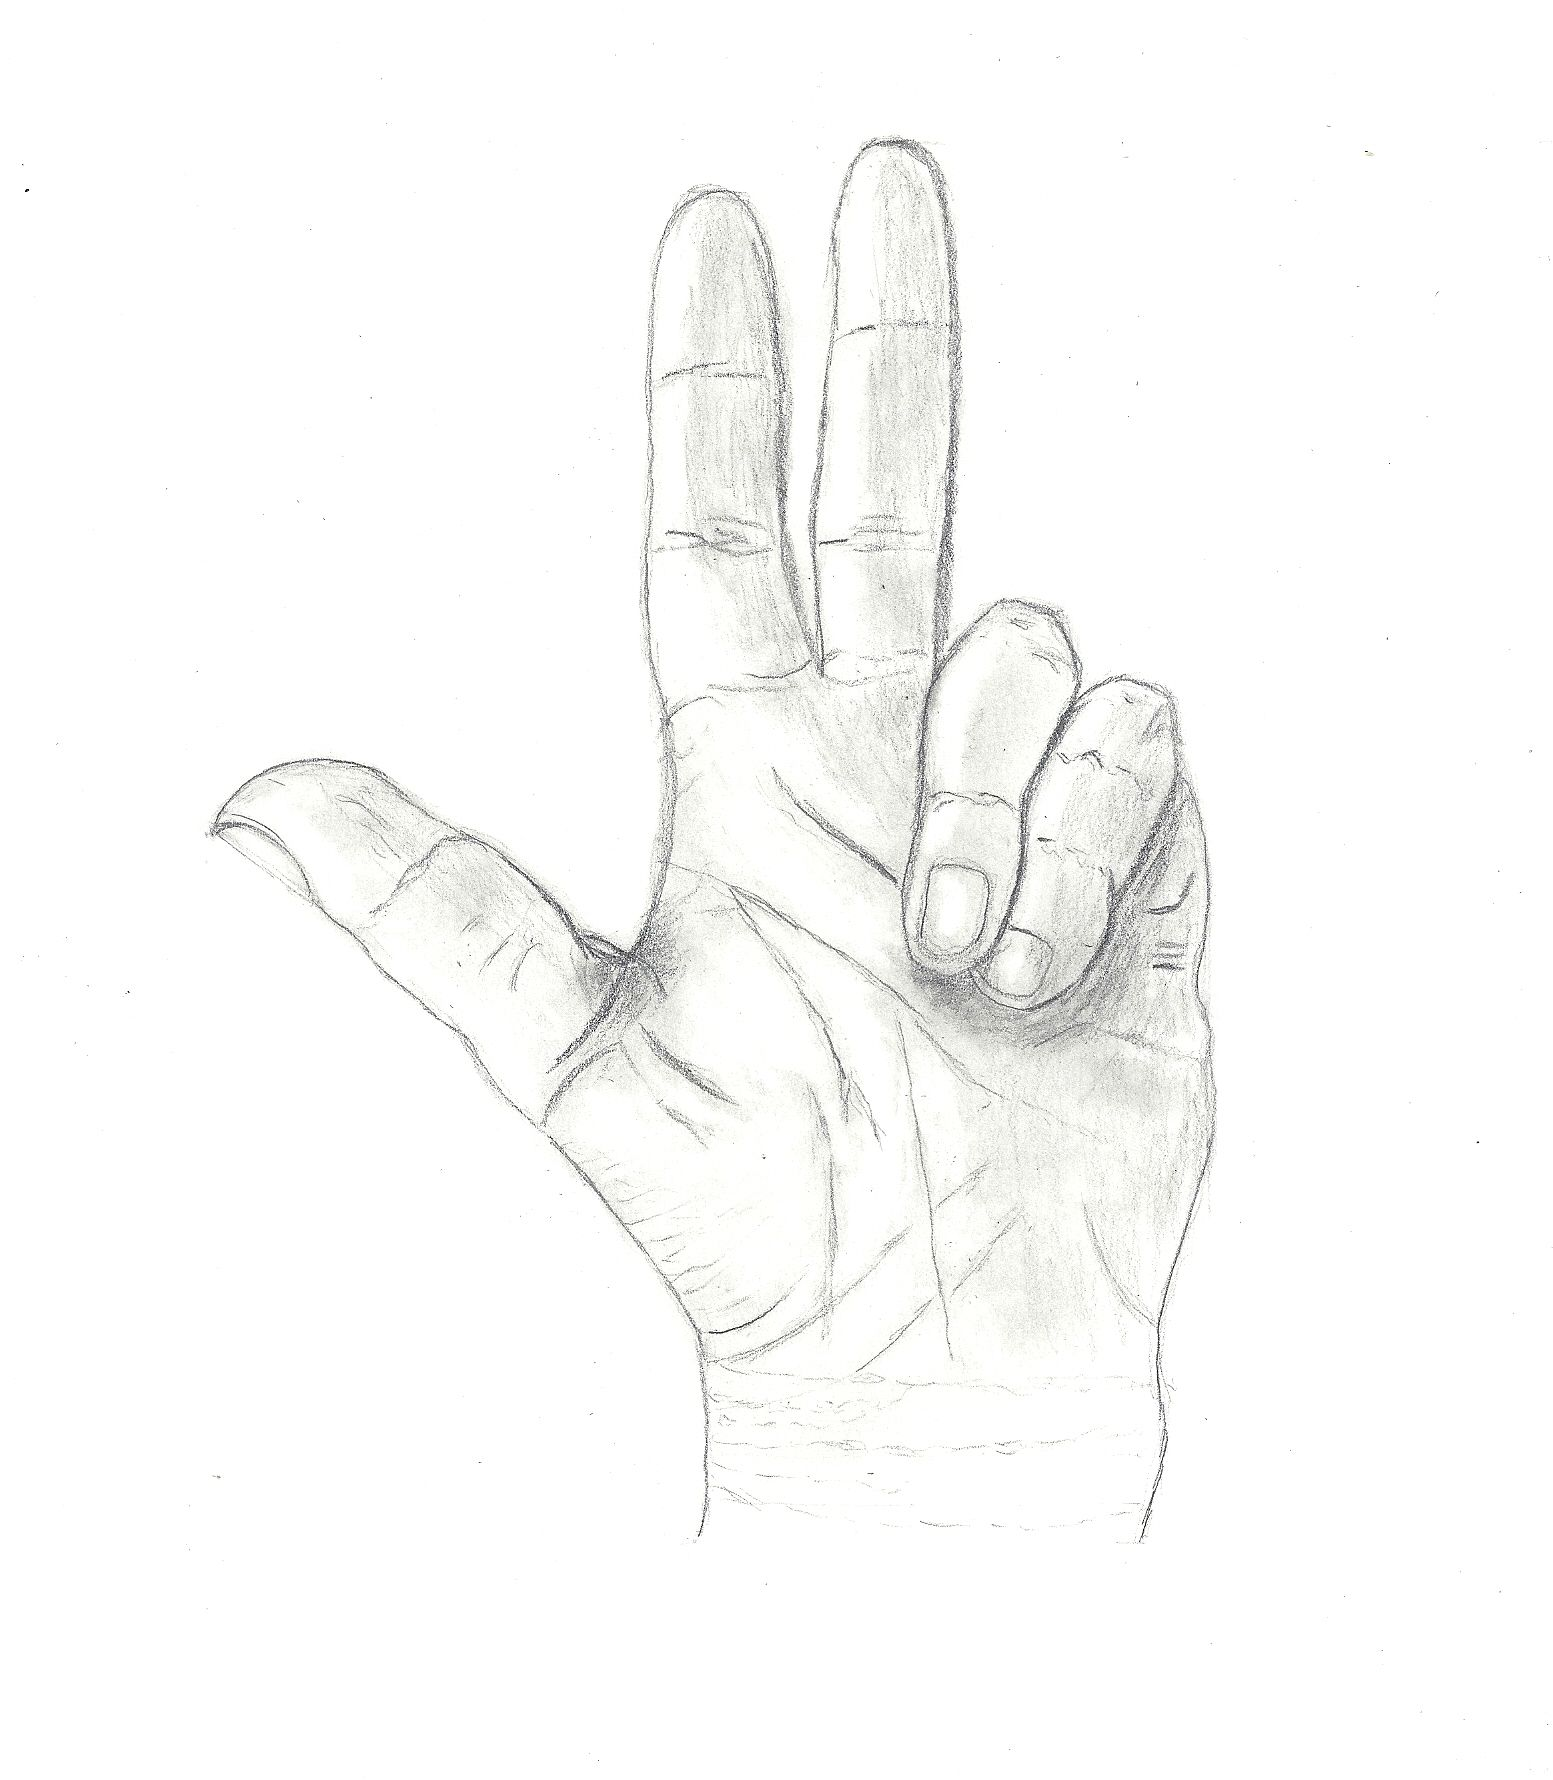 kezem-grafit rajz